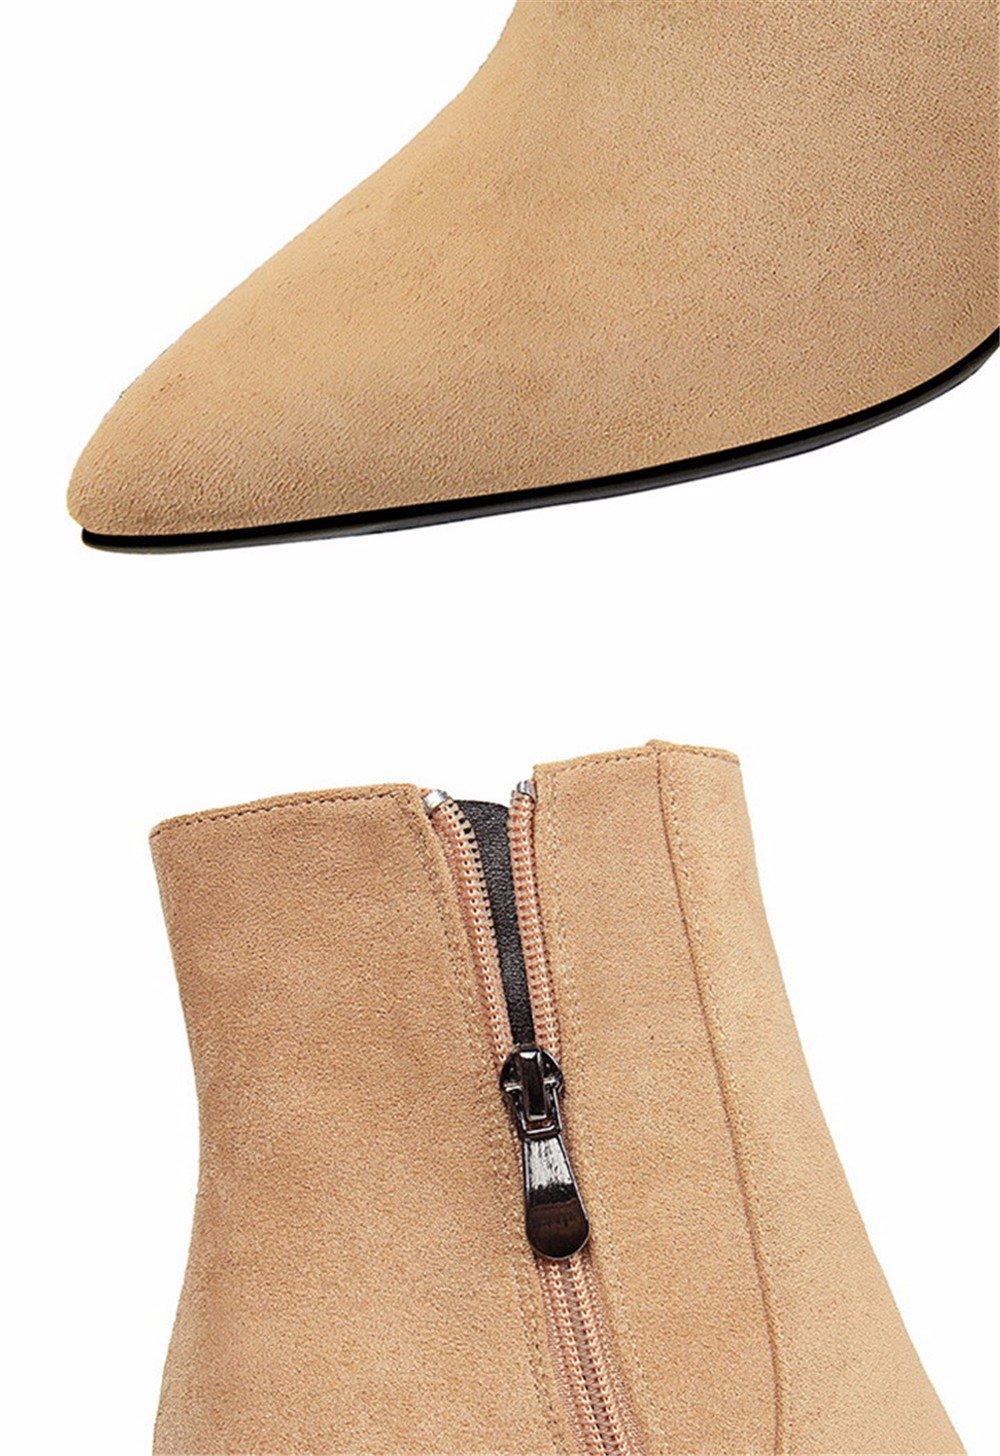 FLYRCX Herbst und Winter dicke warme Leder dicke Ferse Ferse Ferse und Stiefel Damen Party High Heels dfae2c